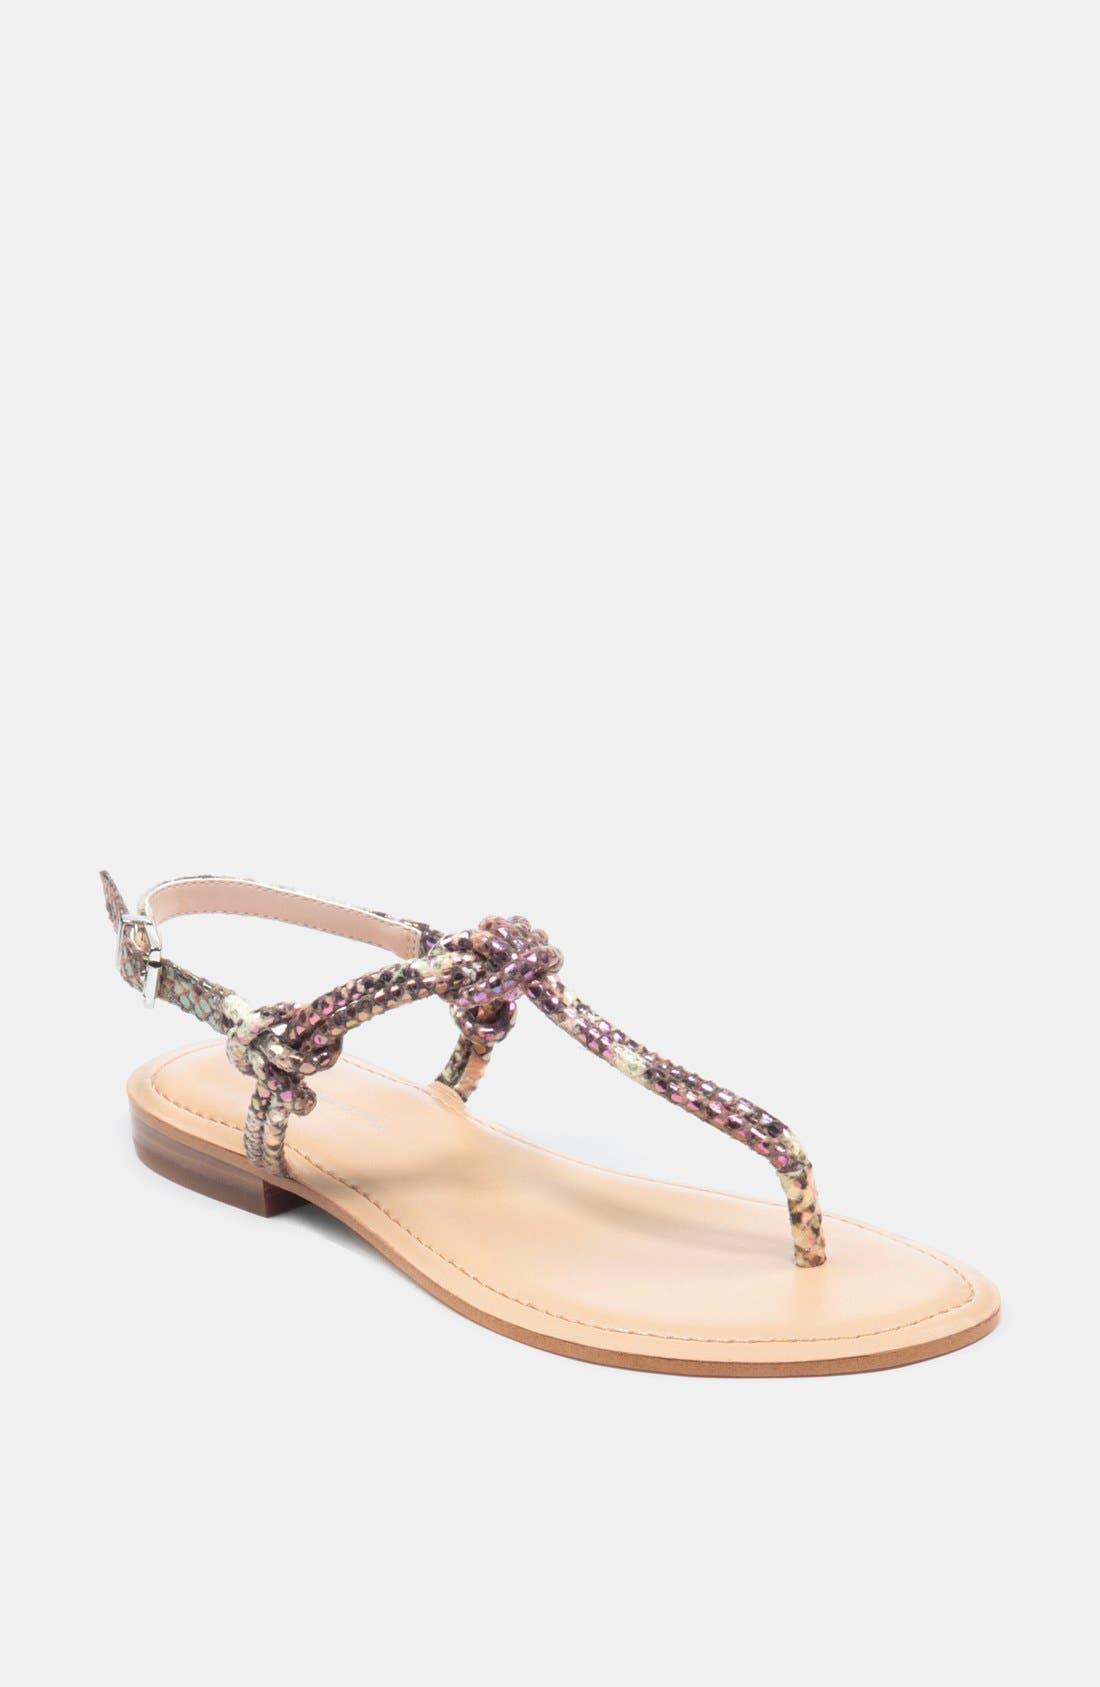 Main Image - BCBGeneration 'Bavia' Sandal